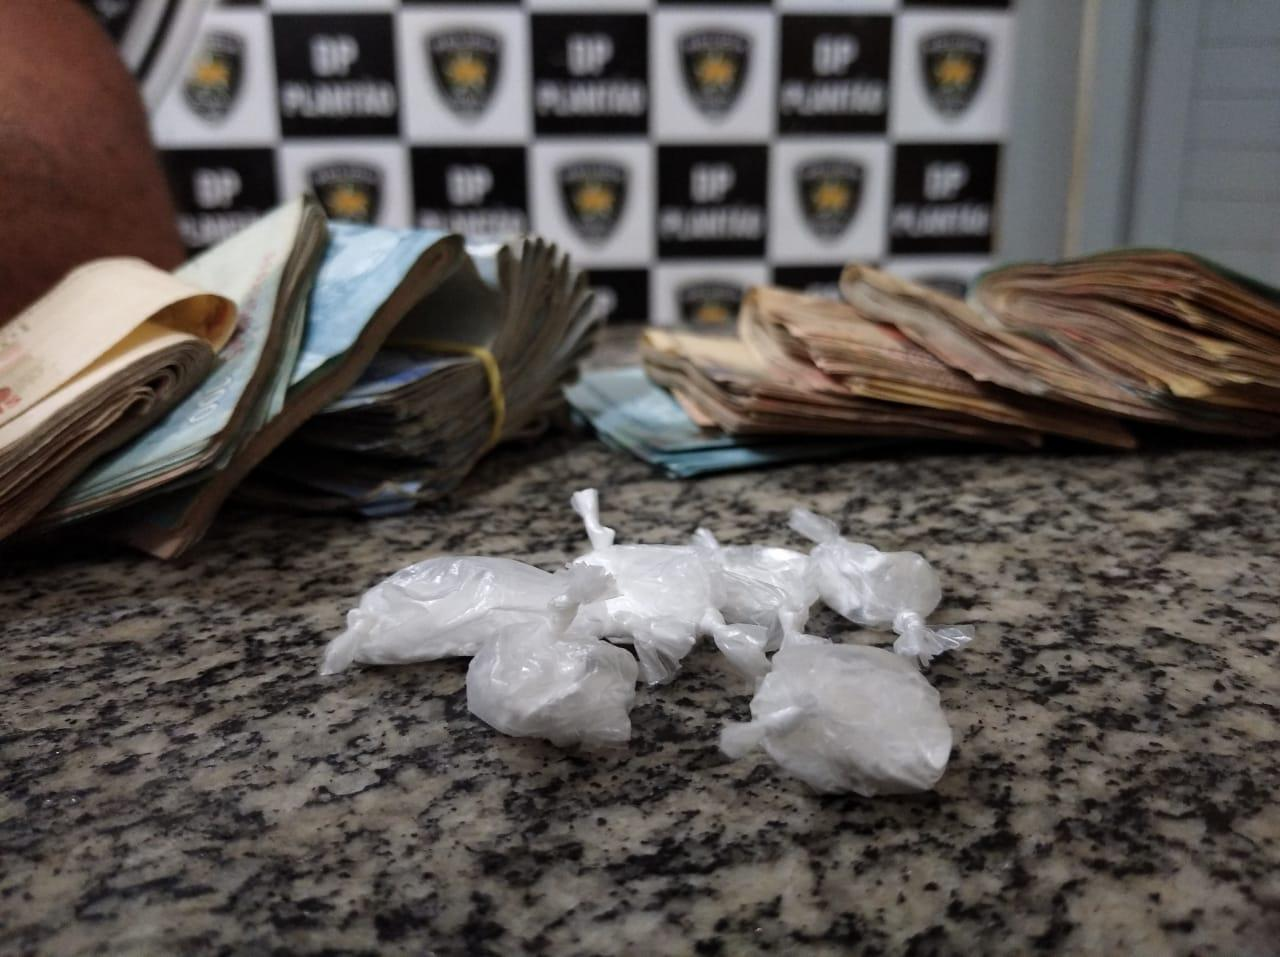 Comerciante é preso por tráfico de drogas no interior do RN